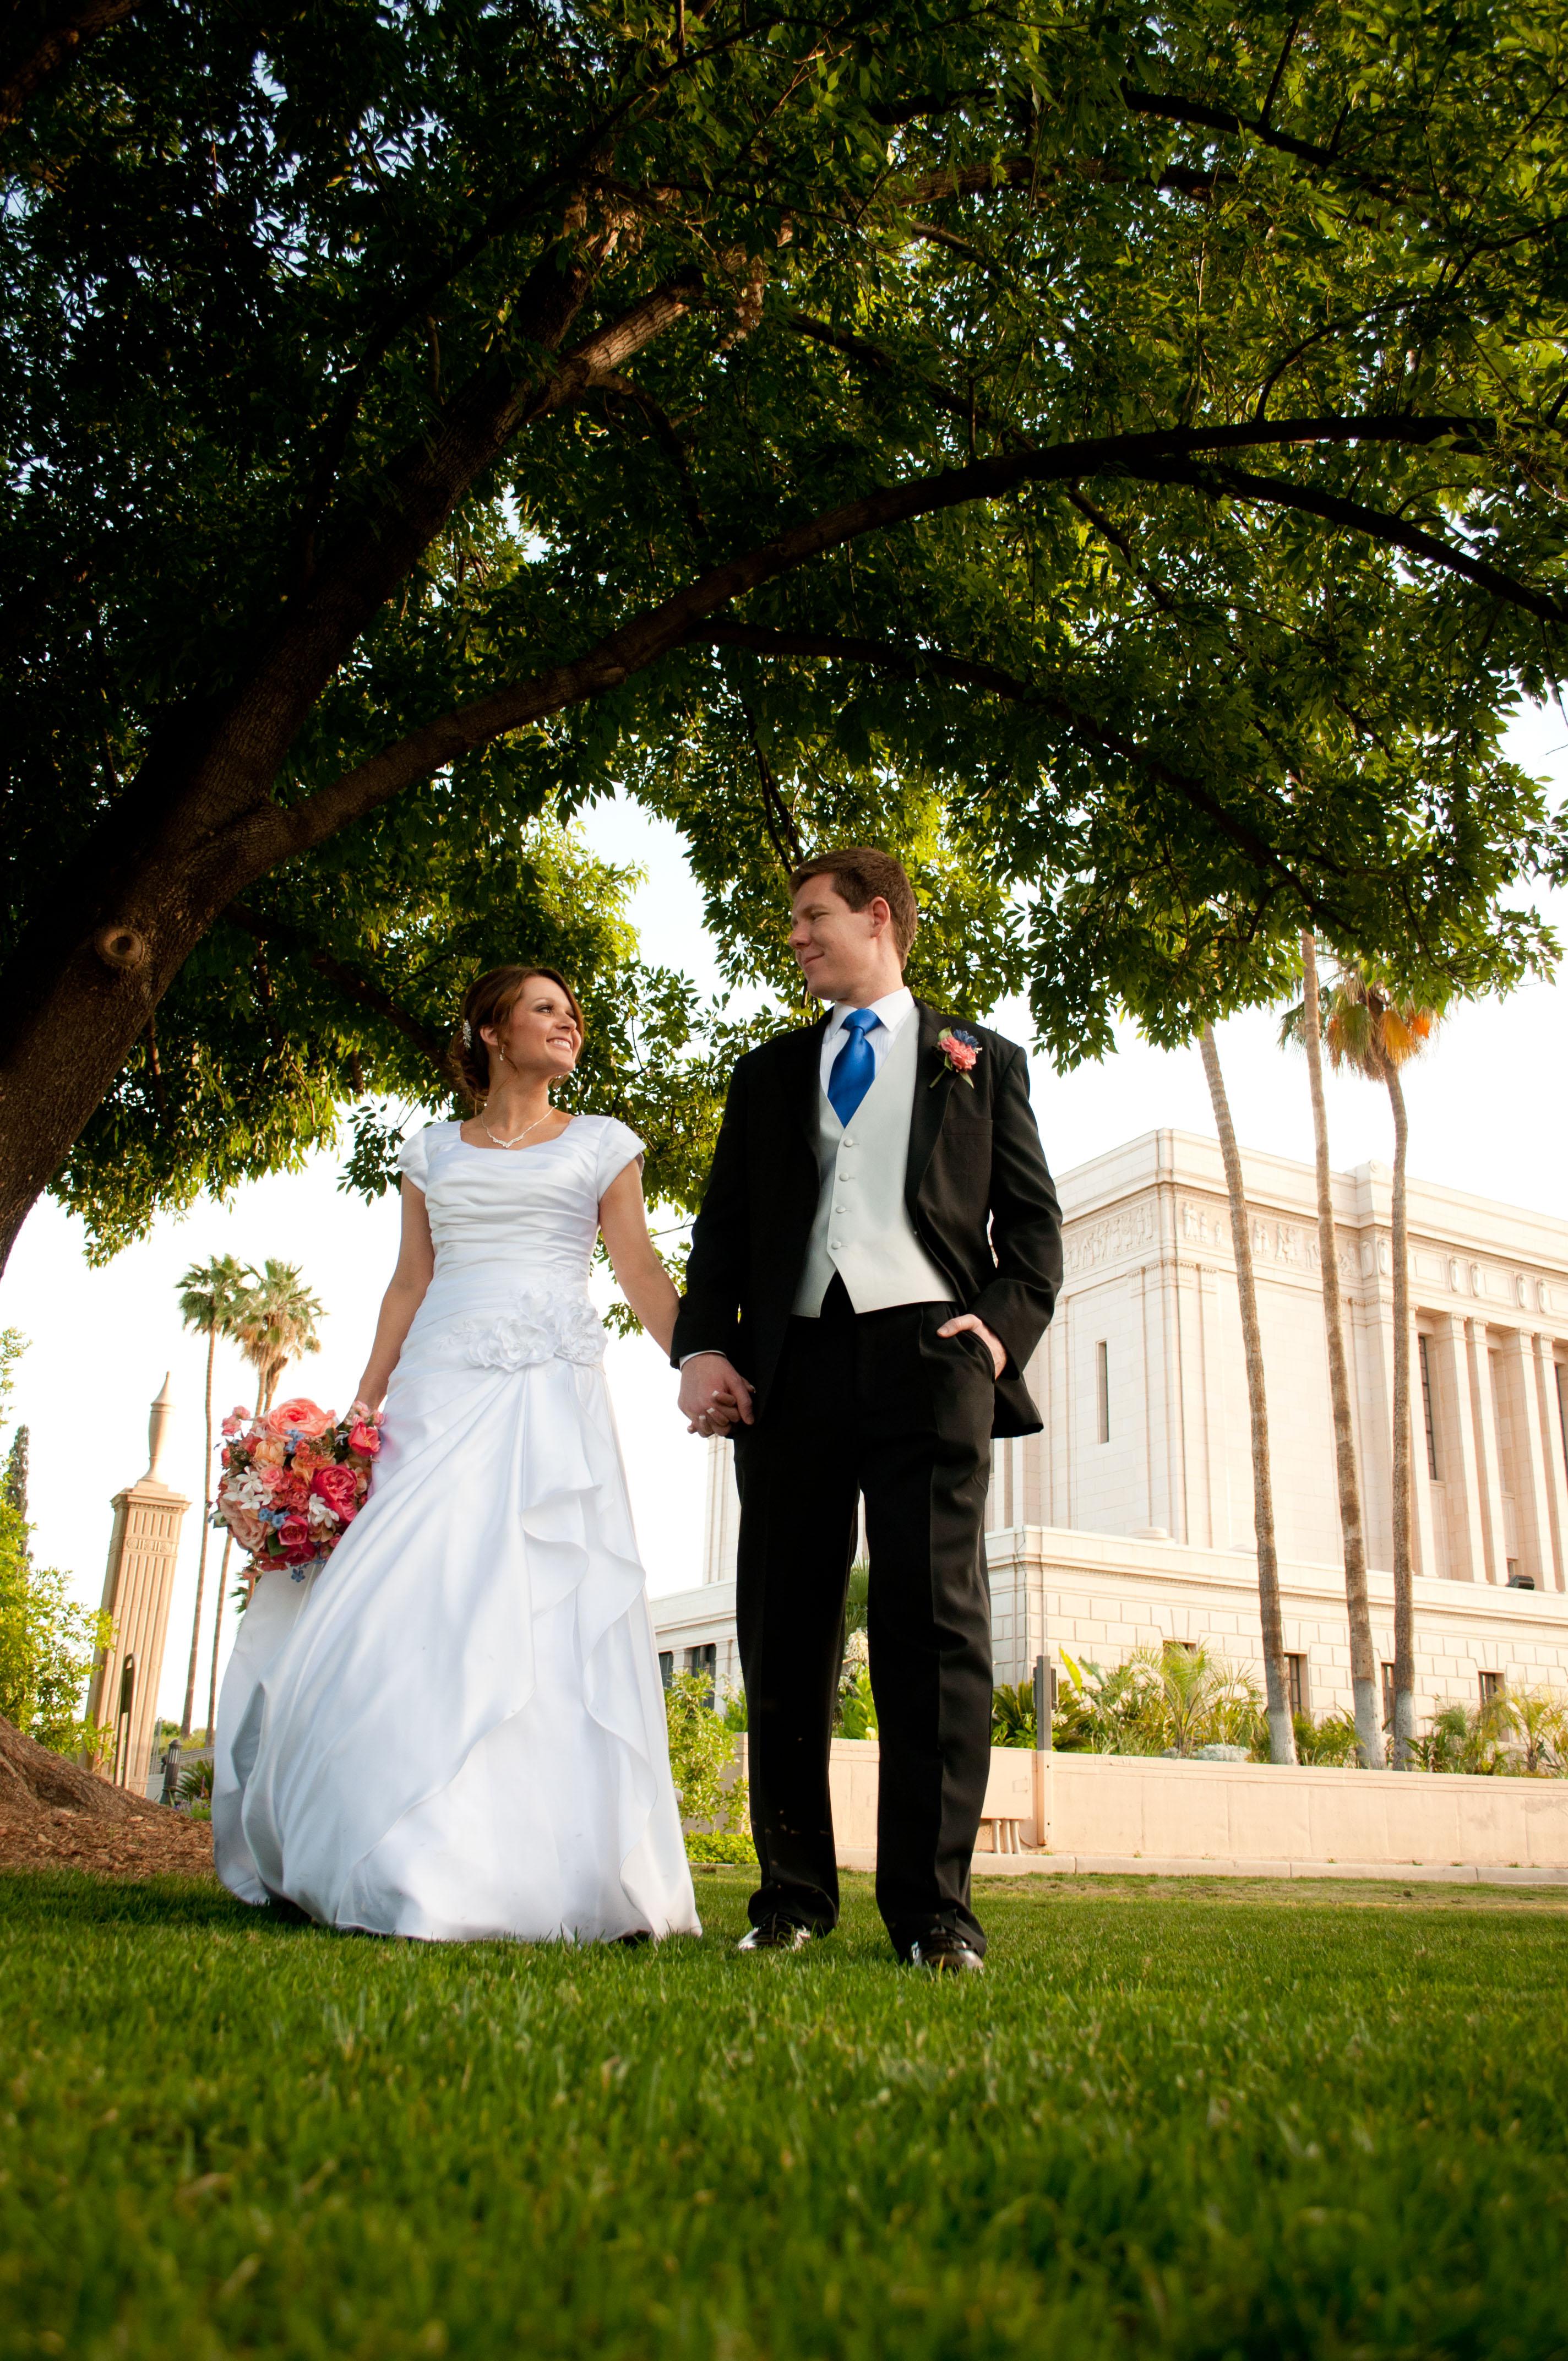 BrideandGroom-60.jpg